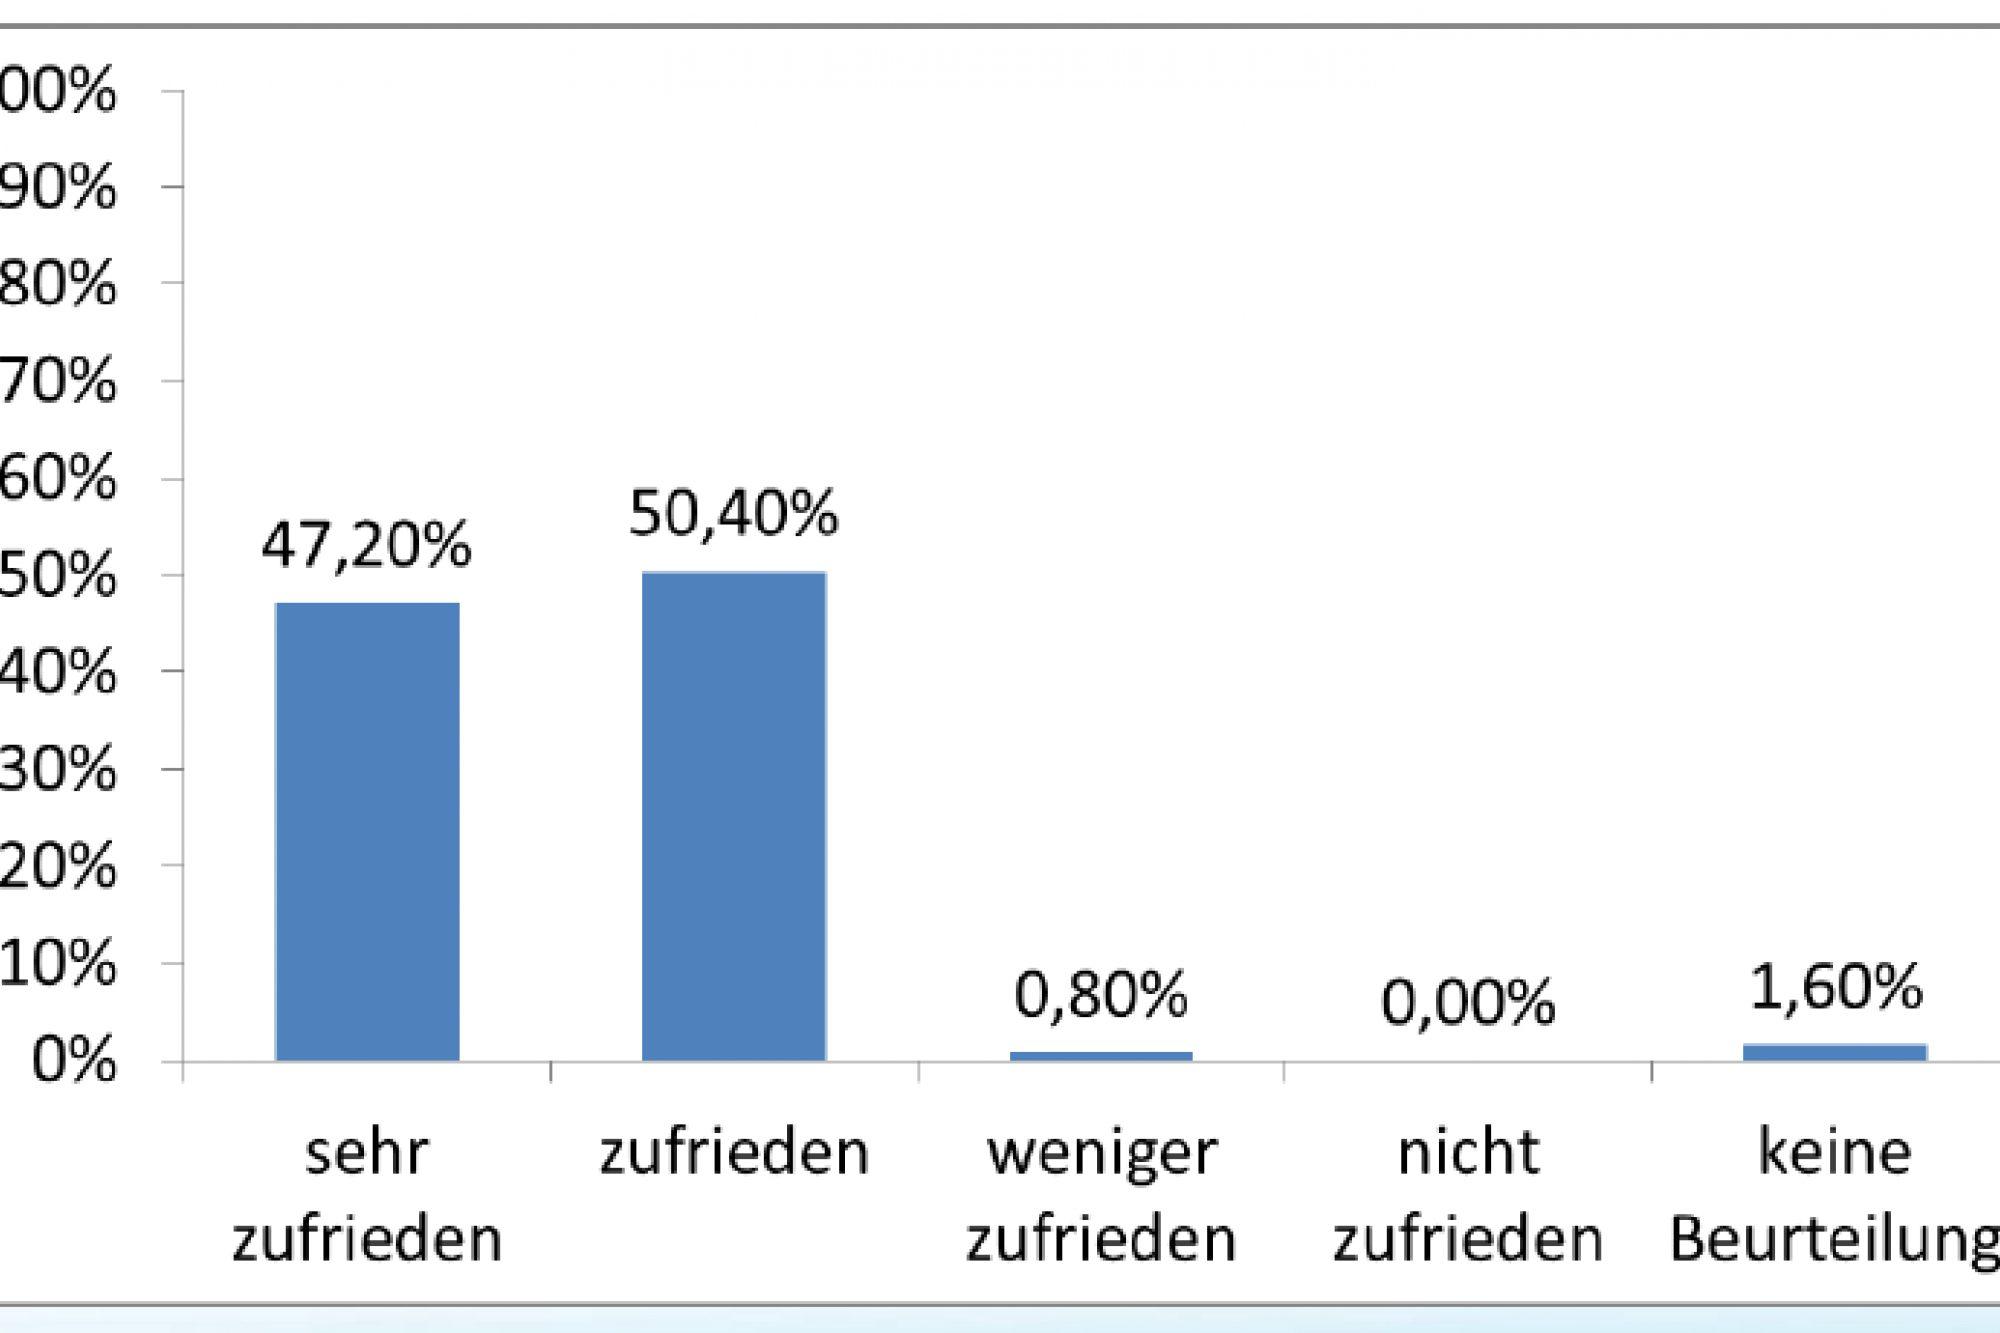 befragung_fernwasserversorgung_Franken.png